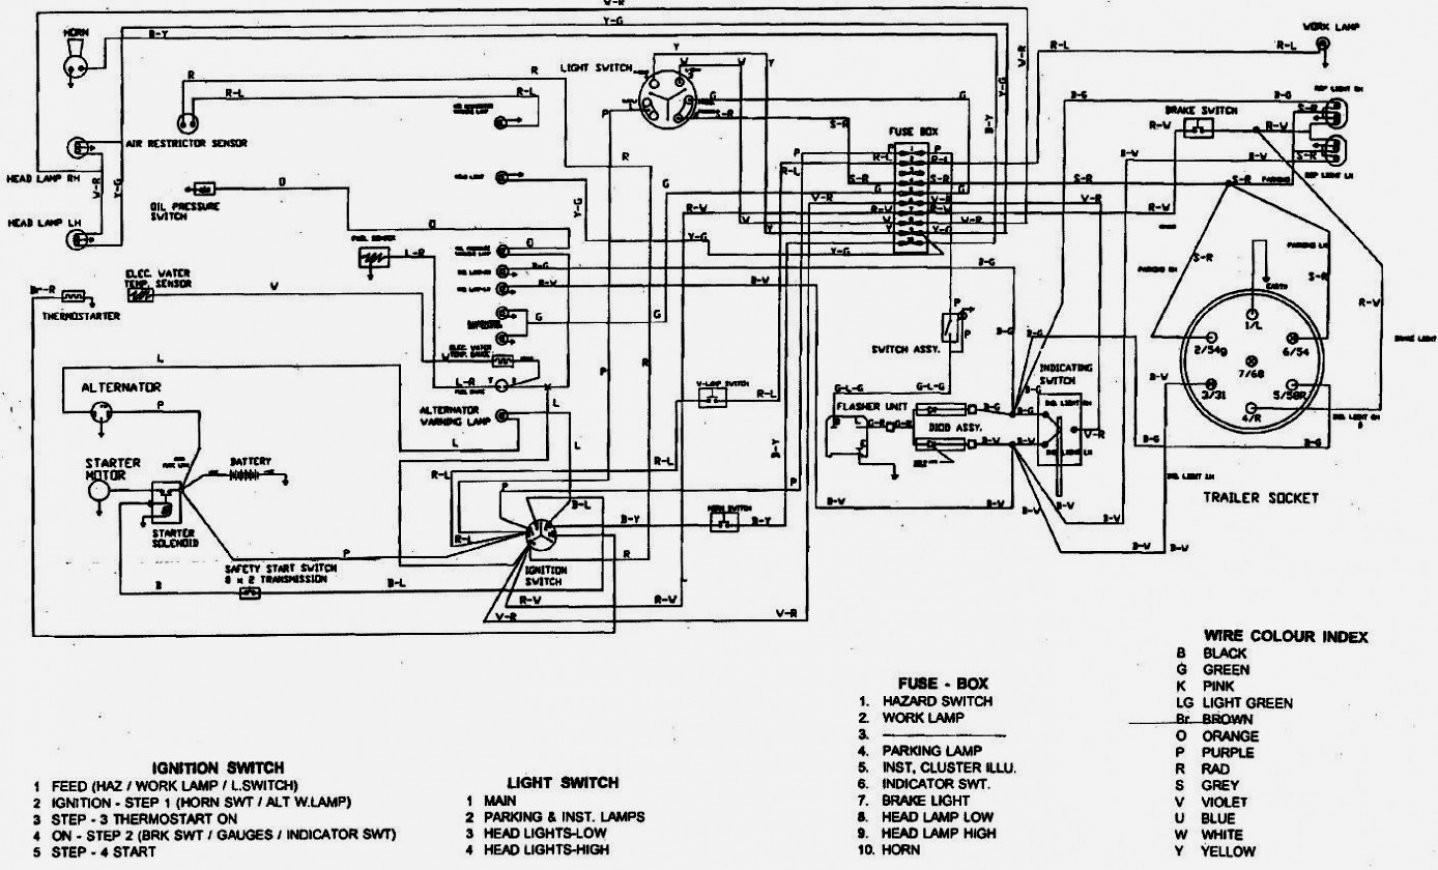 john deere 345 kawasaki wiring diagrams data wiring diagram